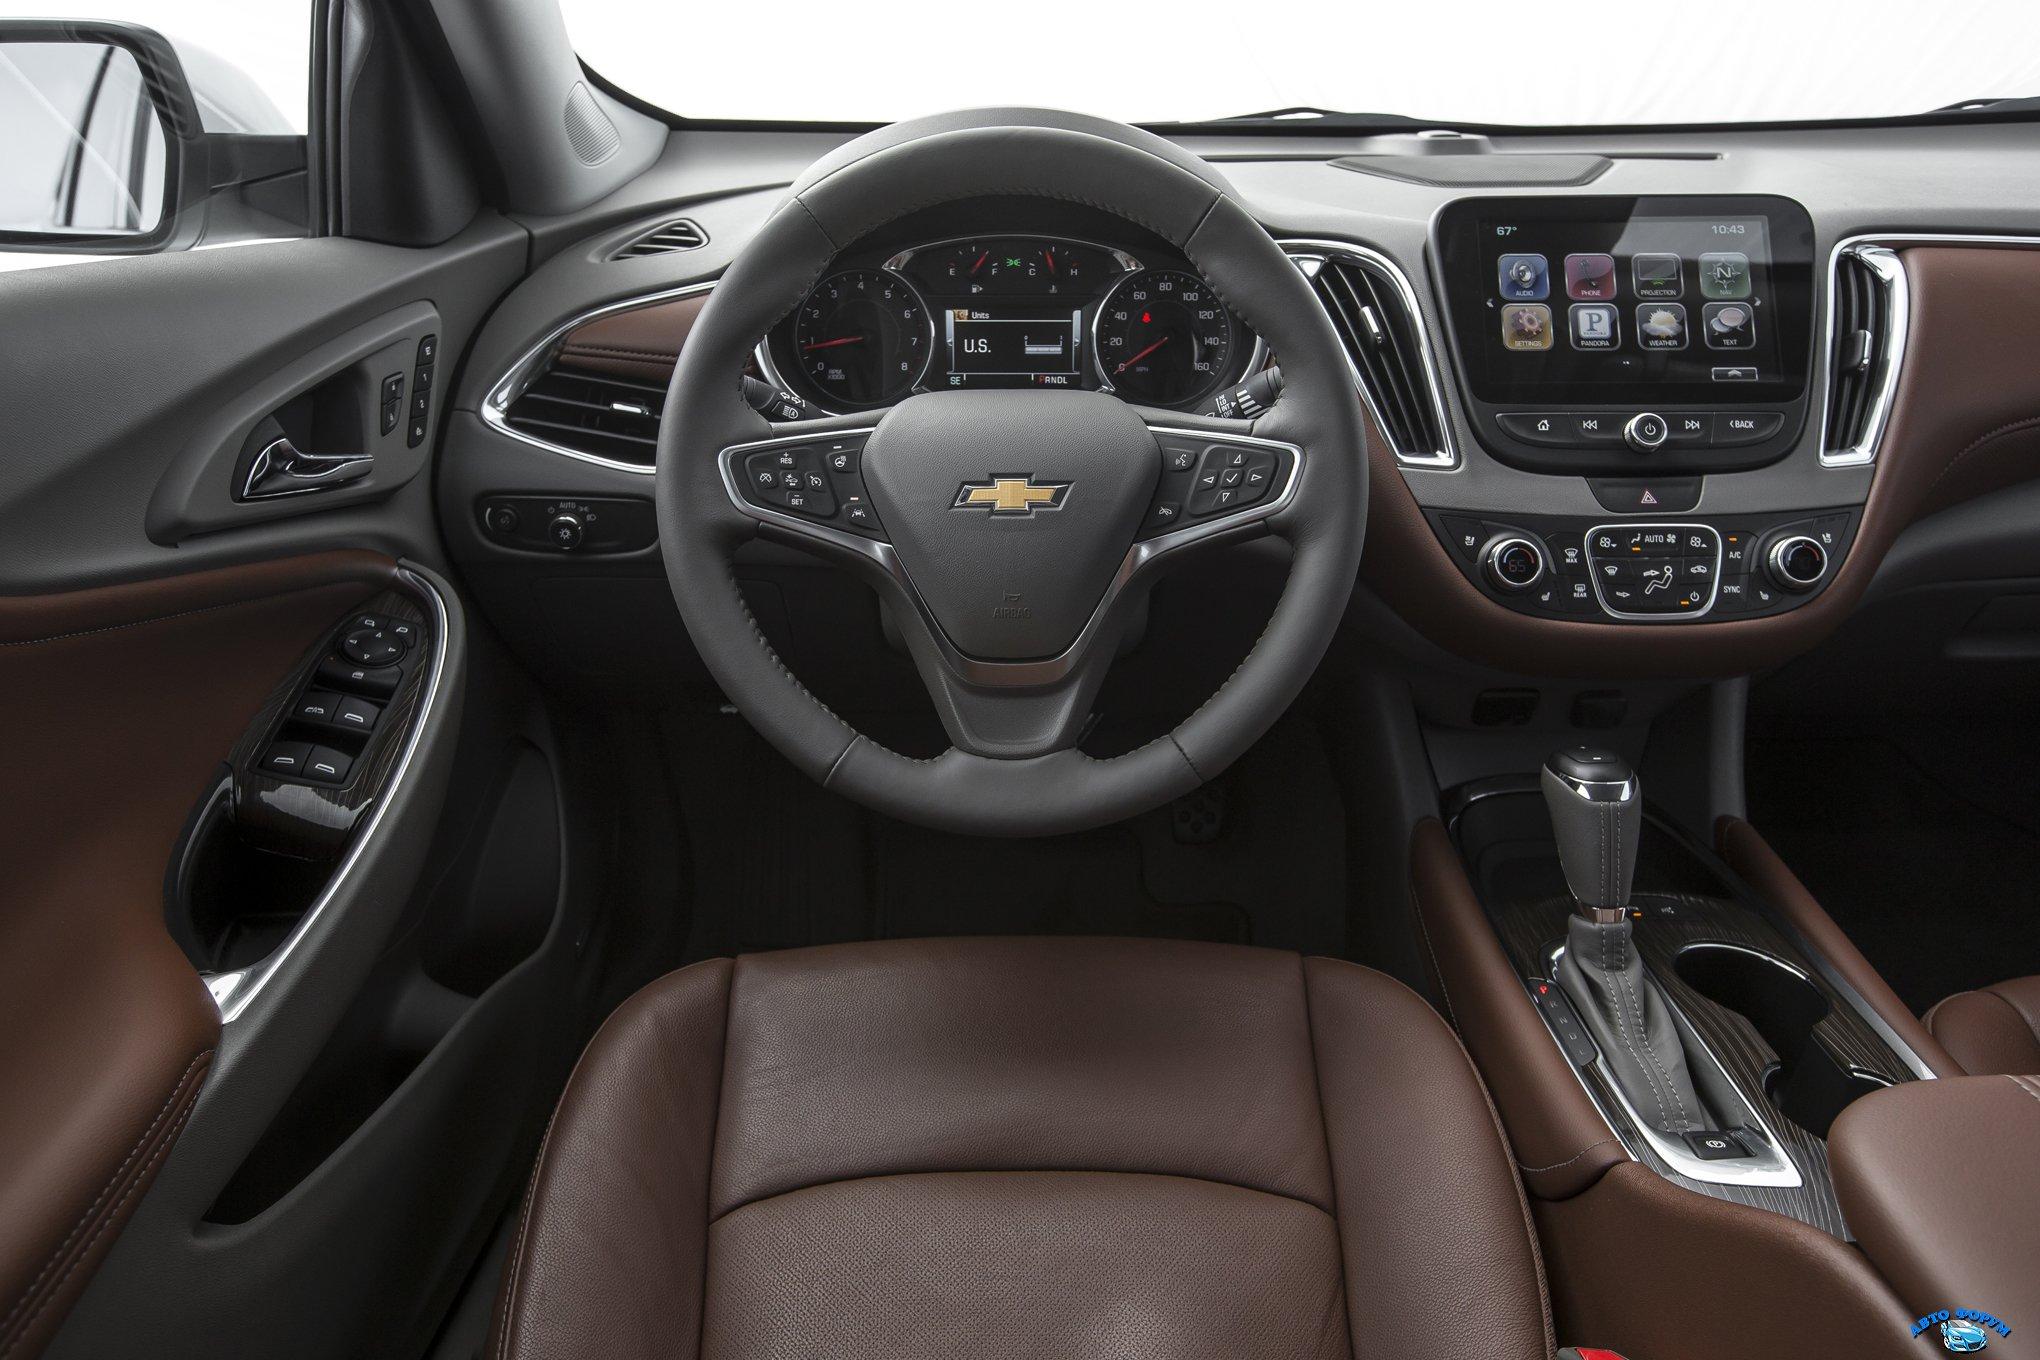 2016-Chevrolet-Malibu-20T-Premier-cockpit.jpg